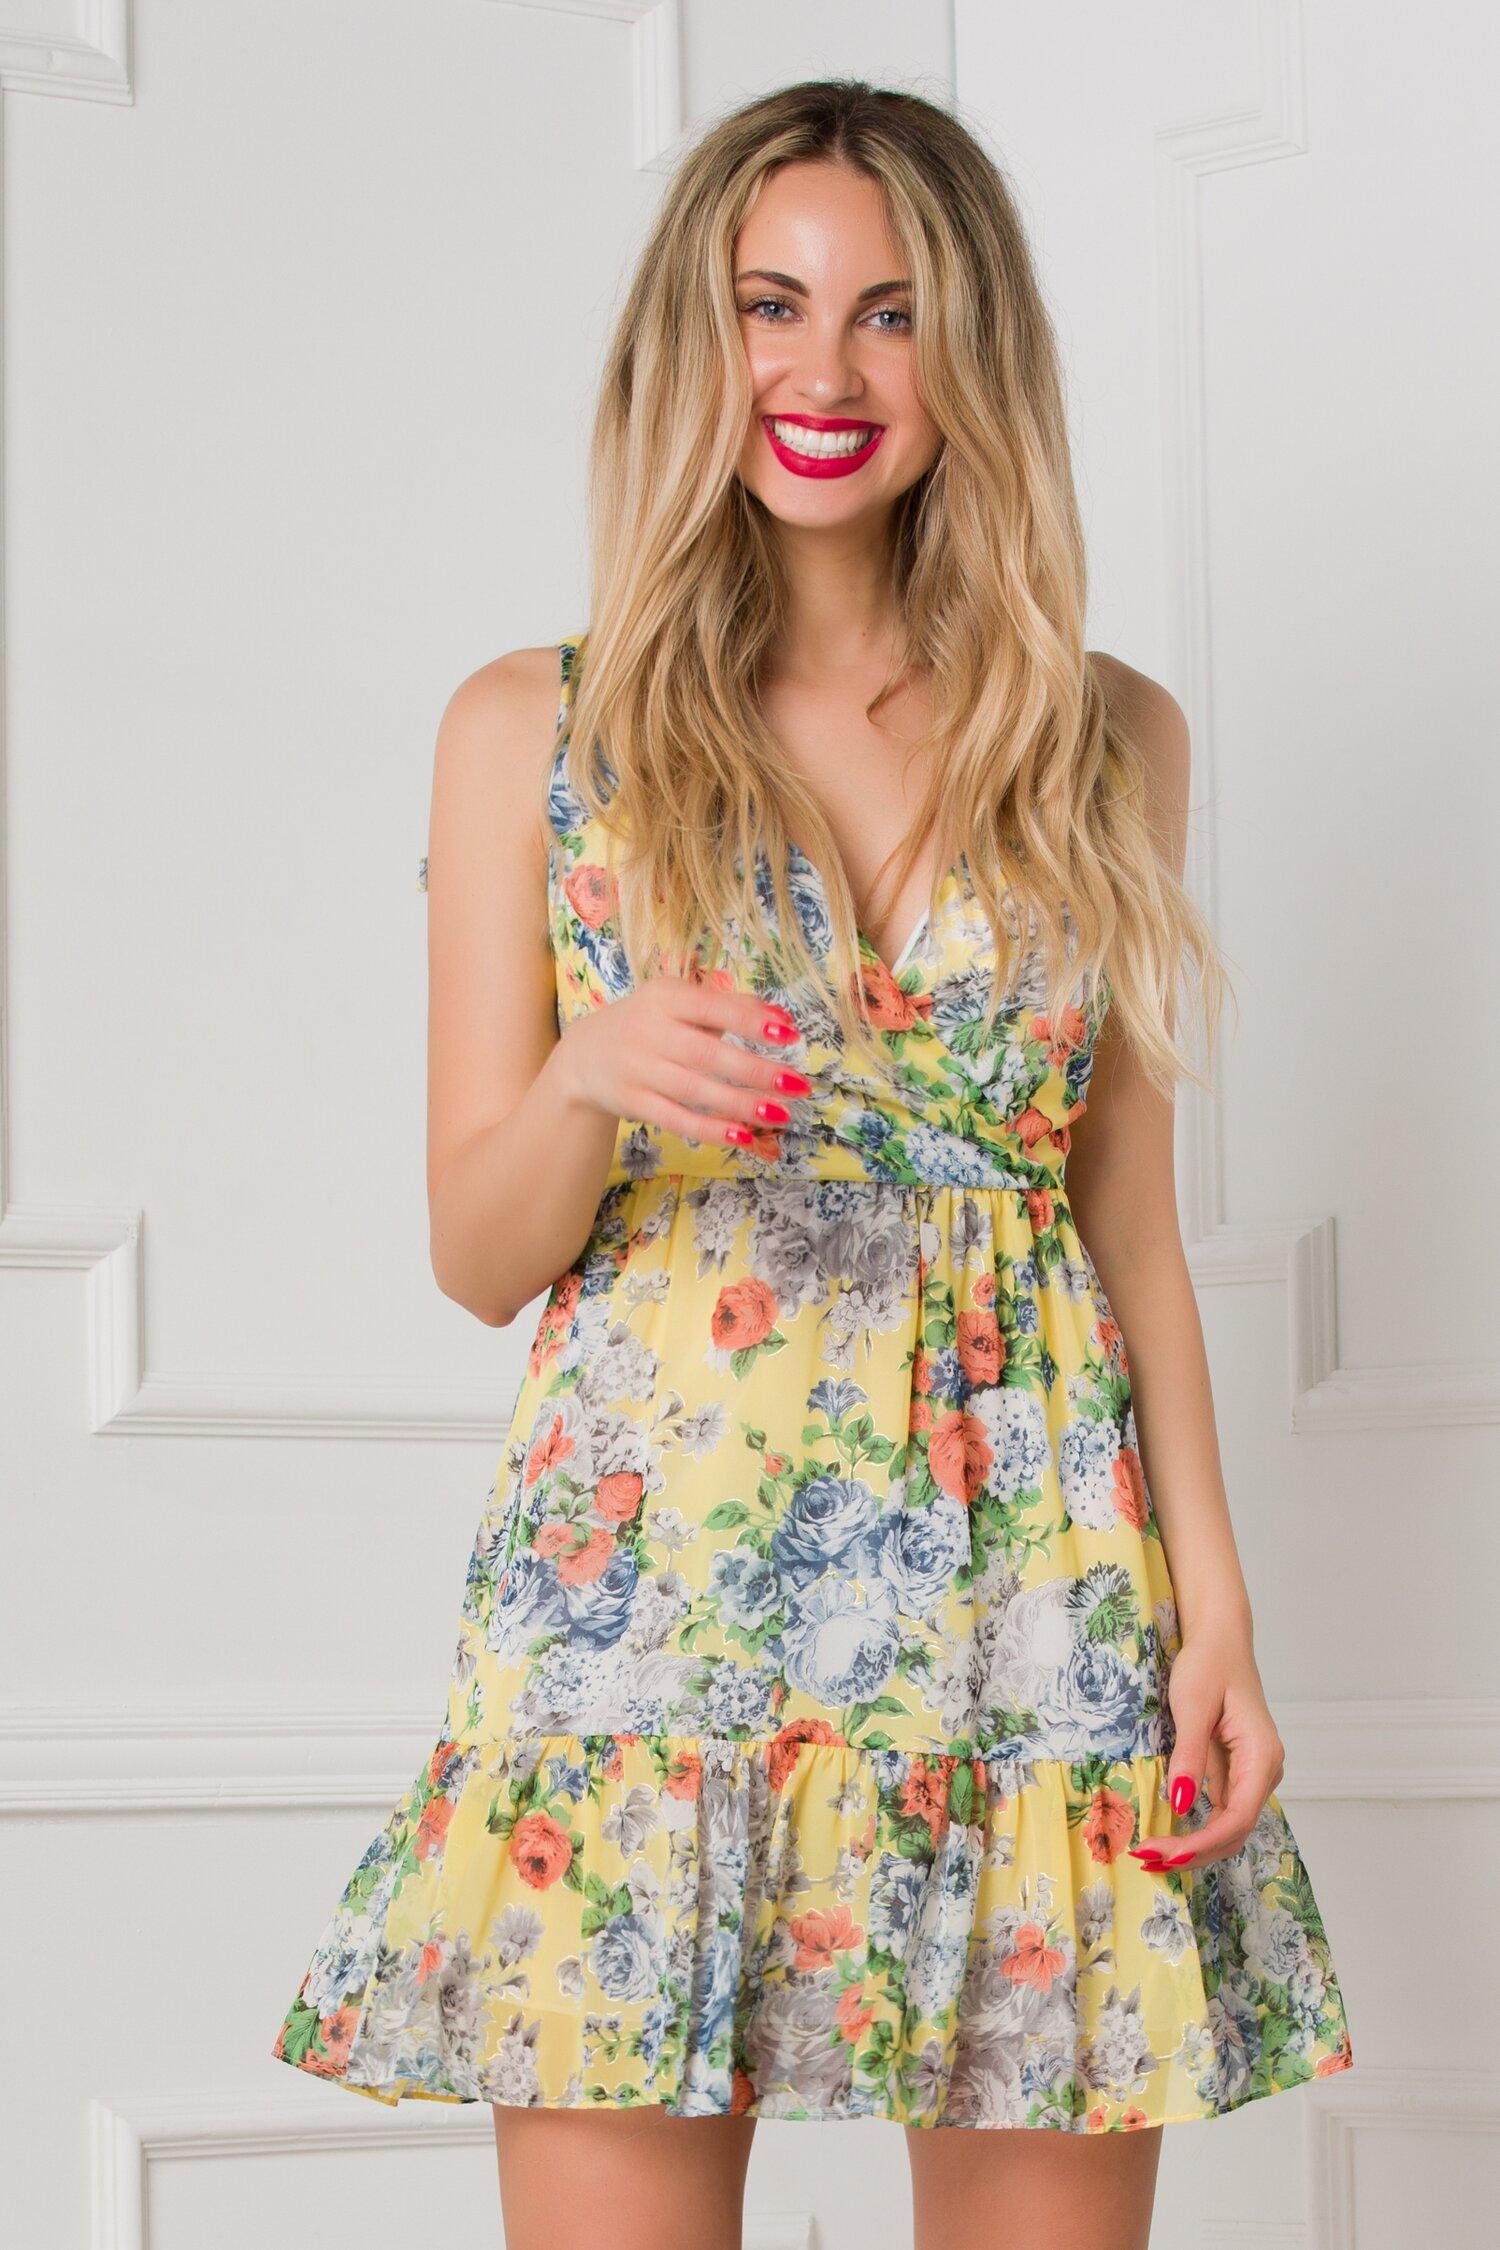 rochie dori vaporoasa galbena cu trandafiri colorati 533121 4